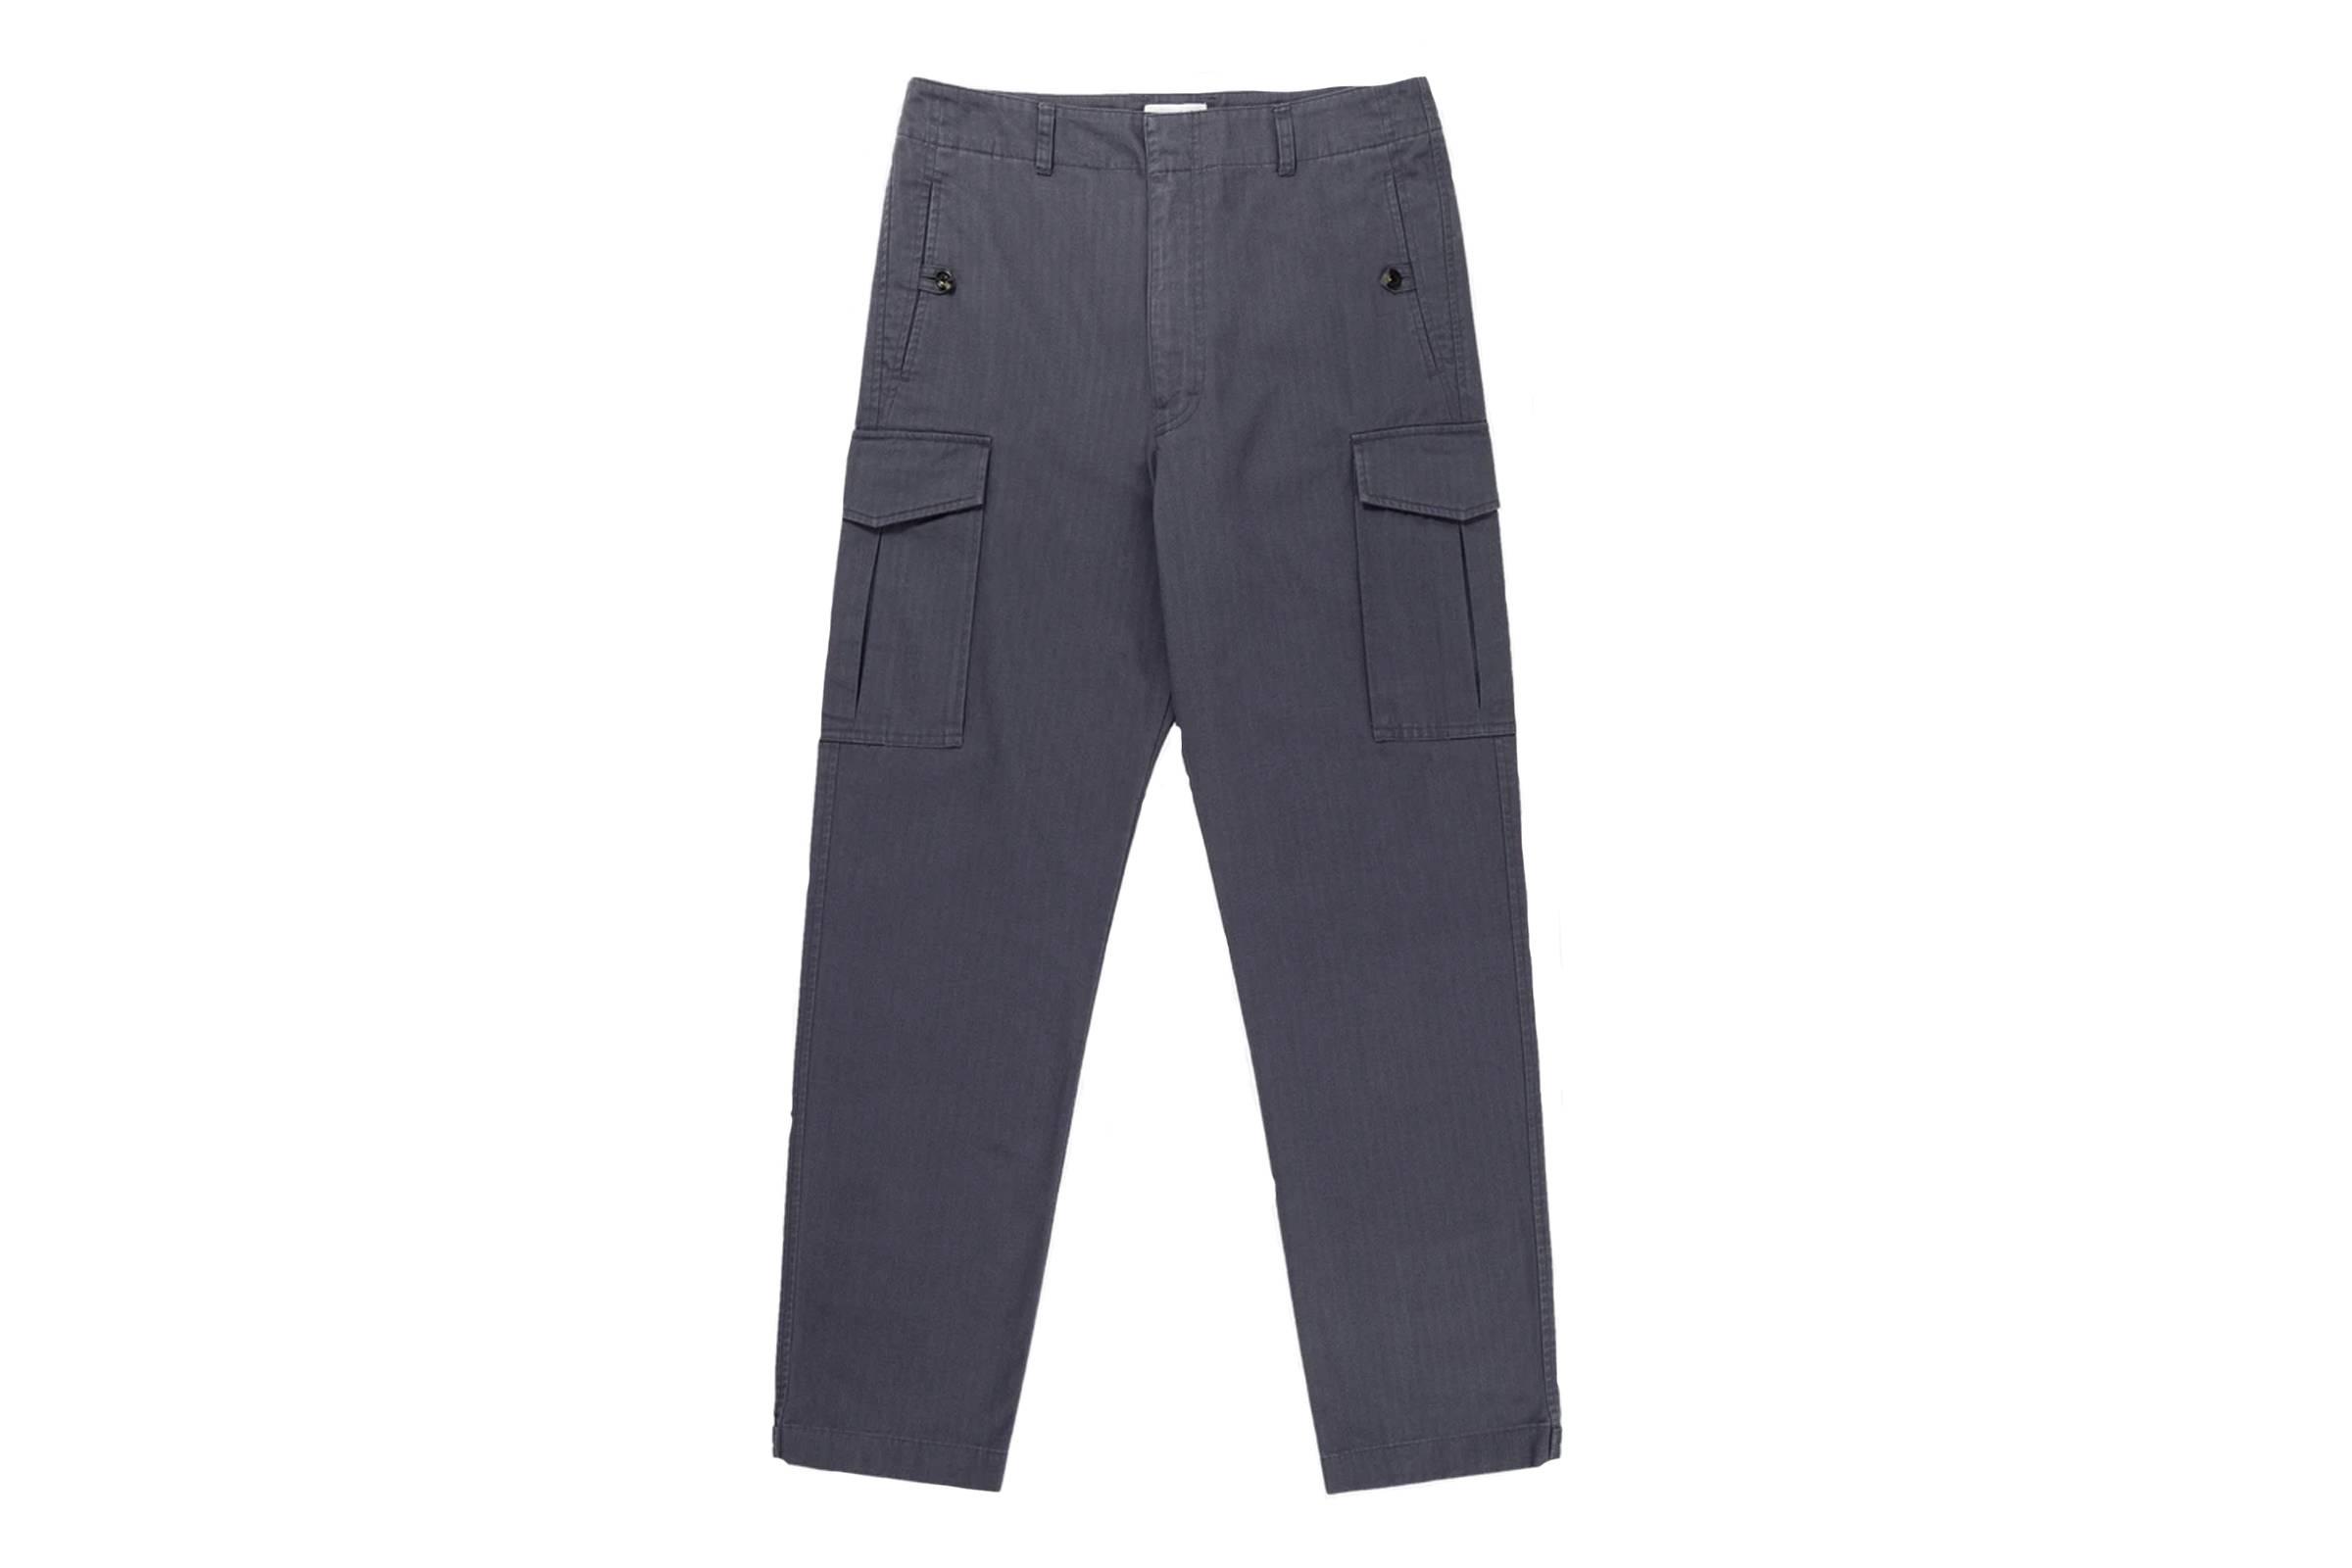 Aimé Leon Dore Utility Cargo Pants